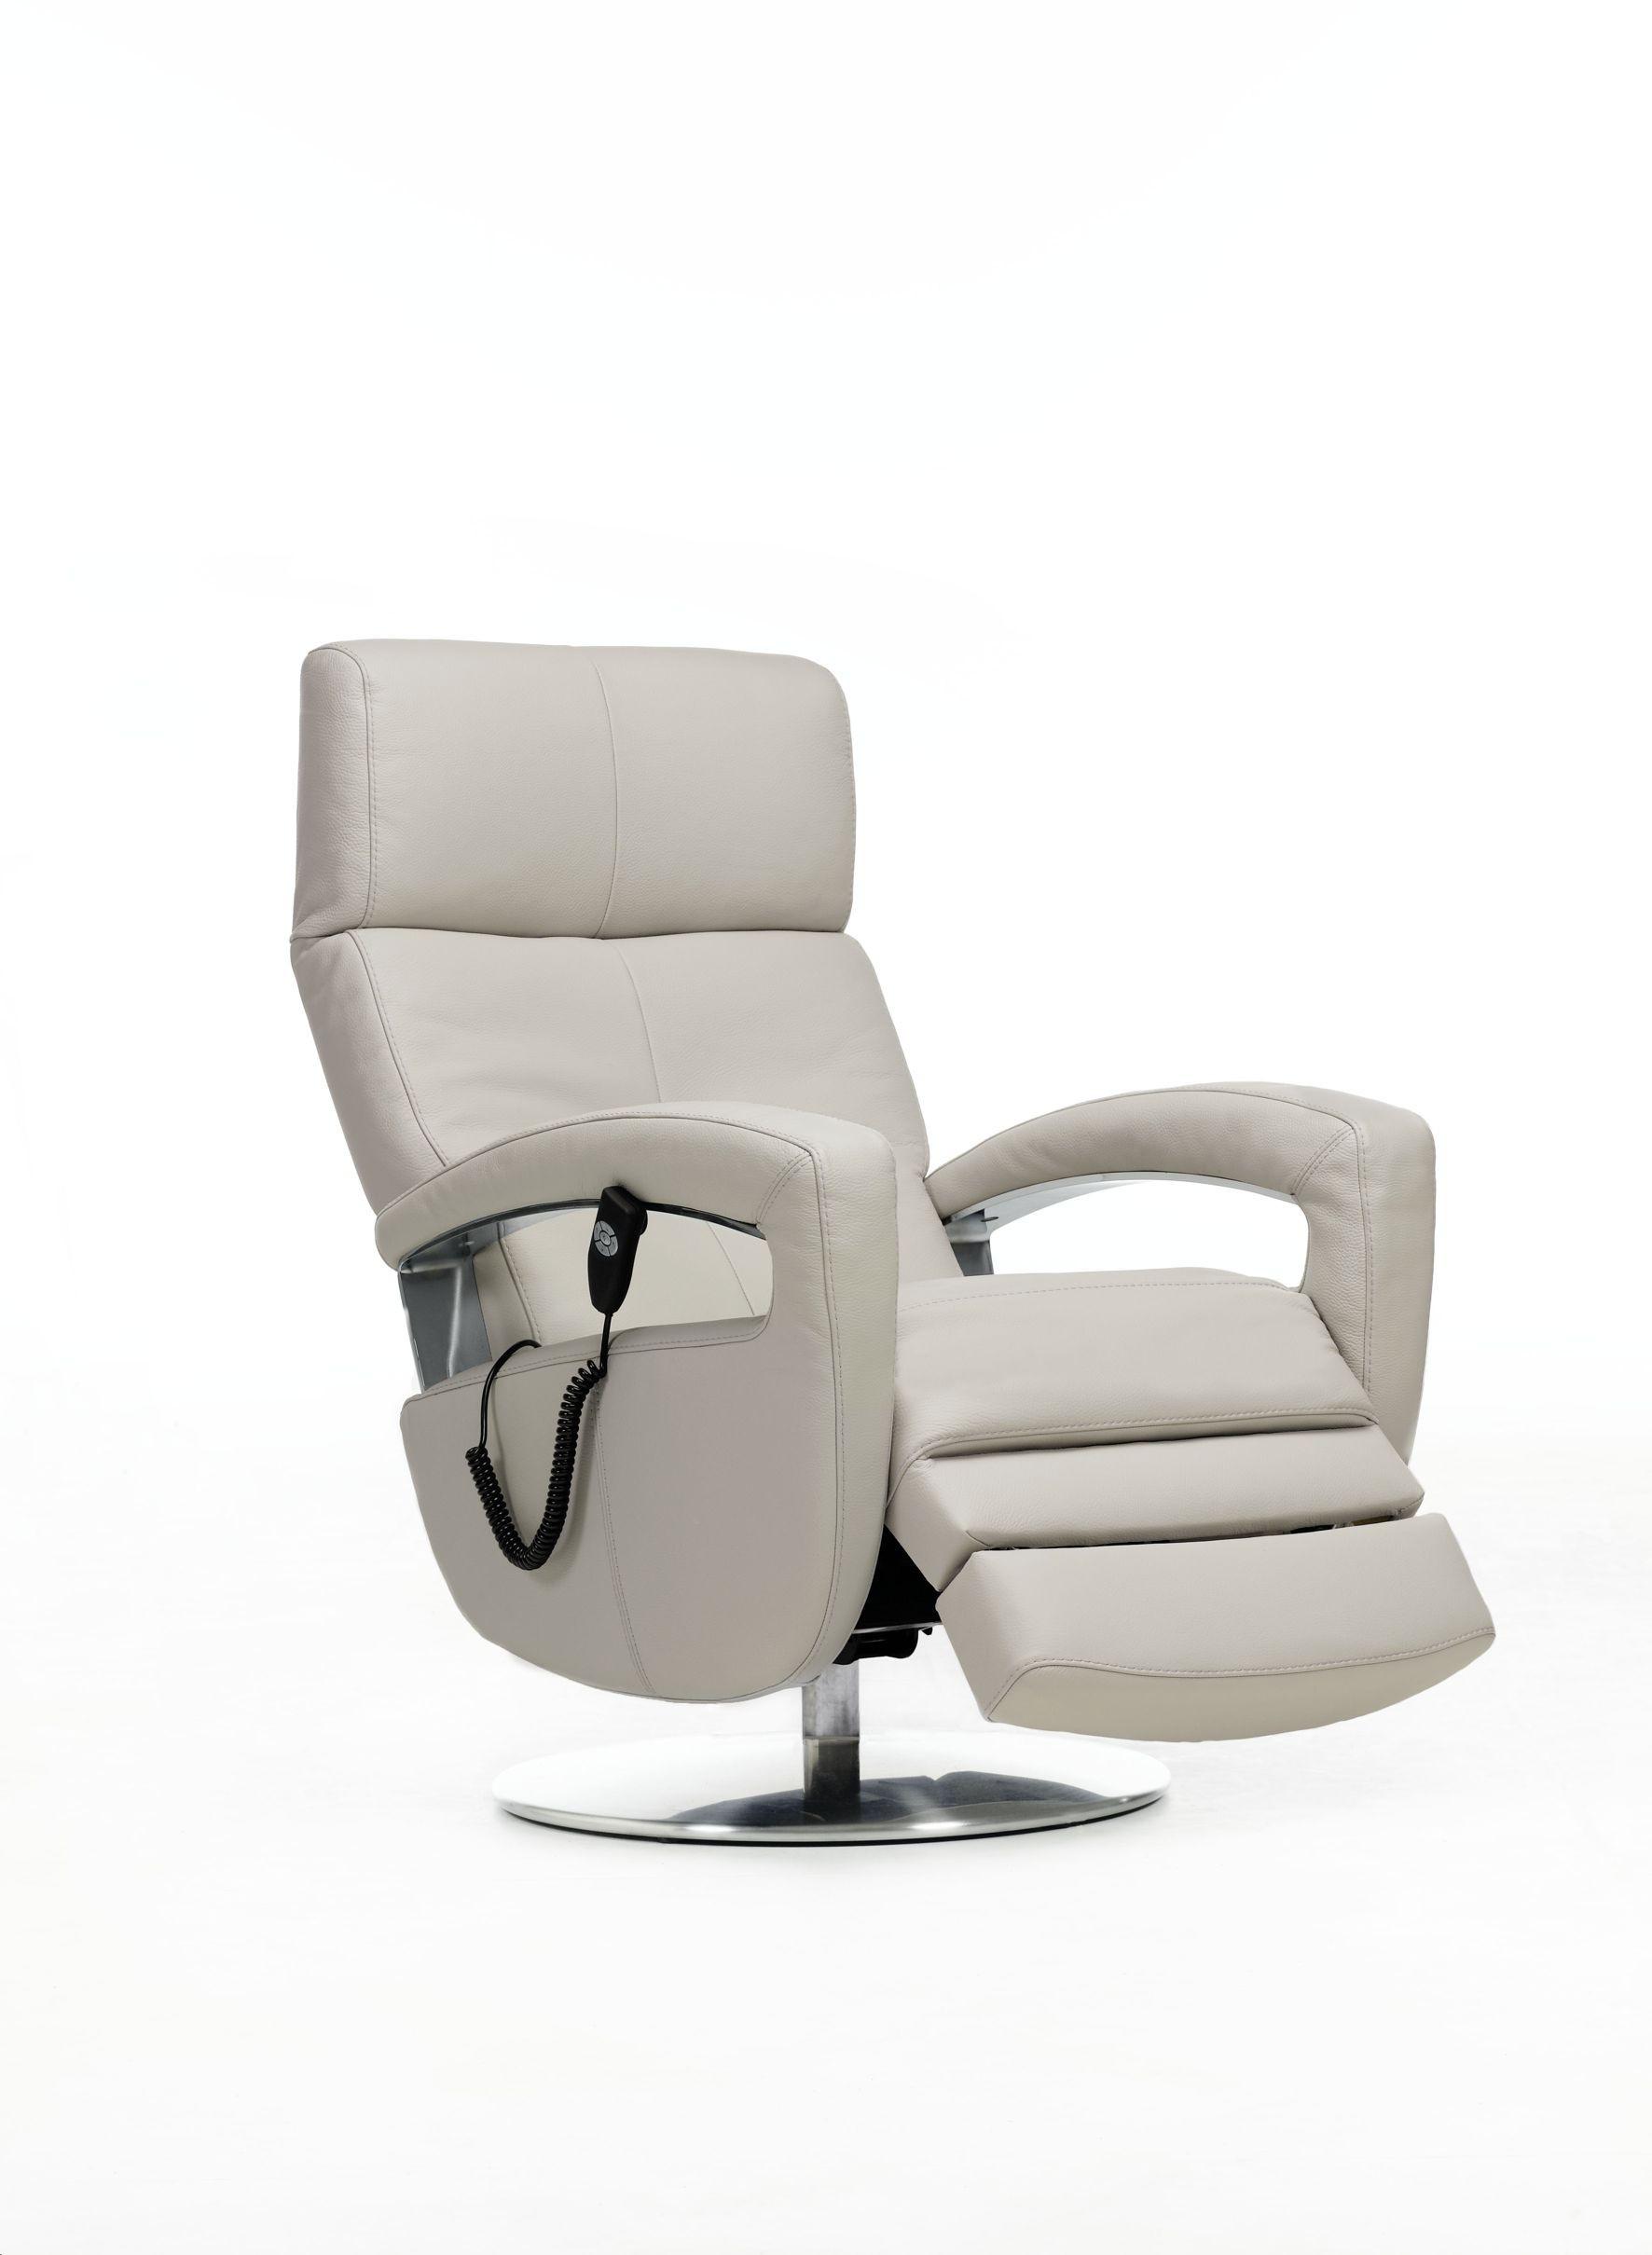 Best ideas about Modern Recliner Chair . Save or Pin TIAGO Modern Recliner Now.